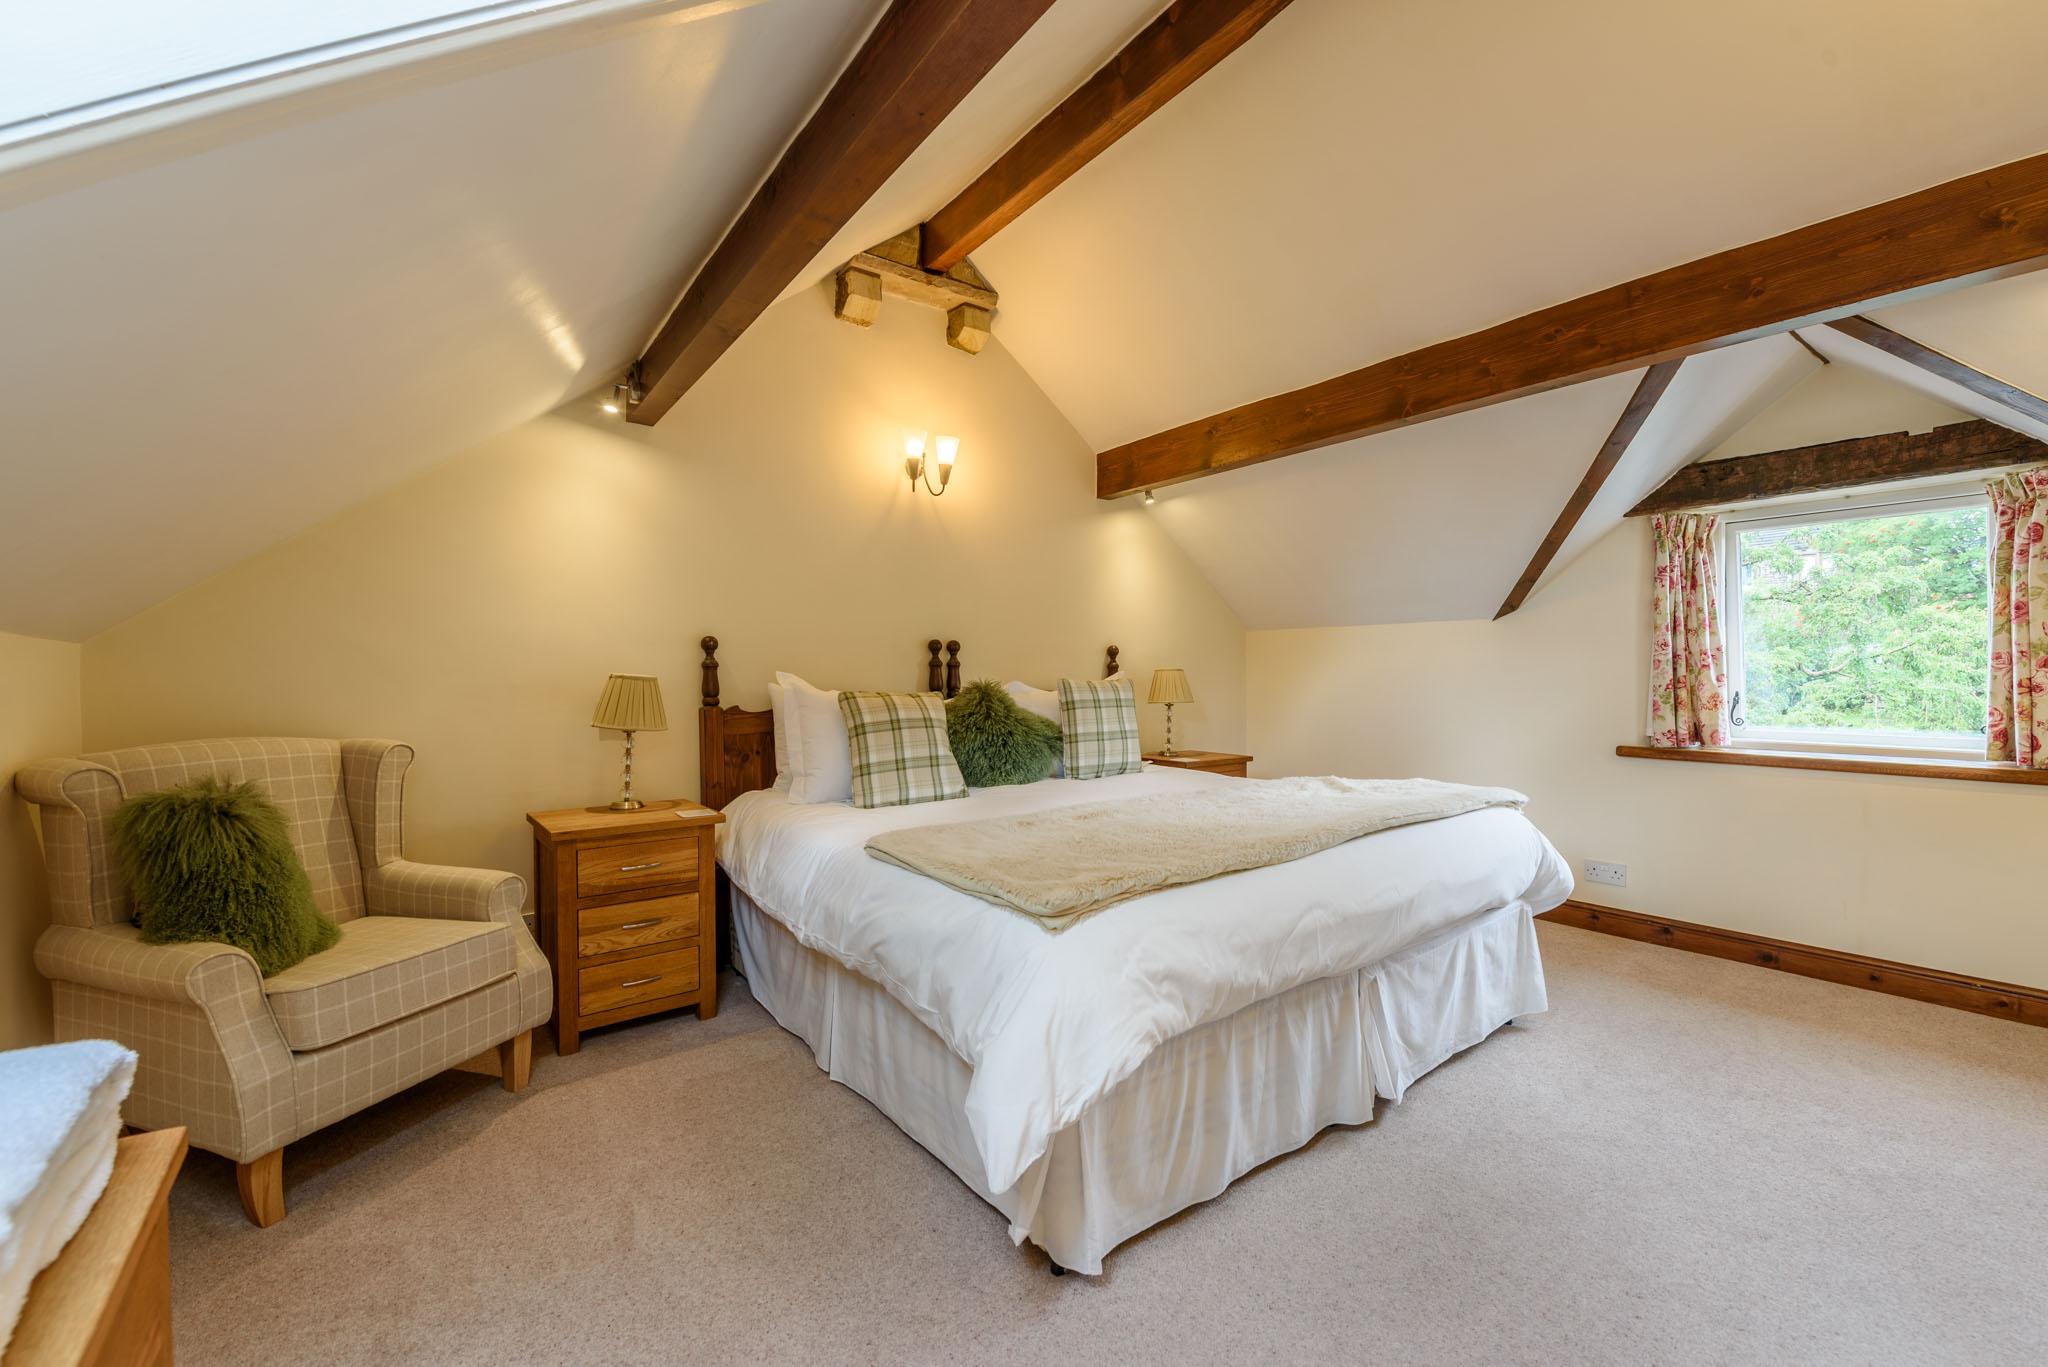 Bedroom with village views